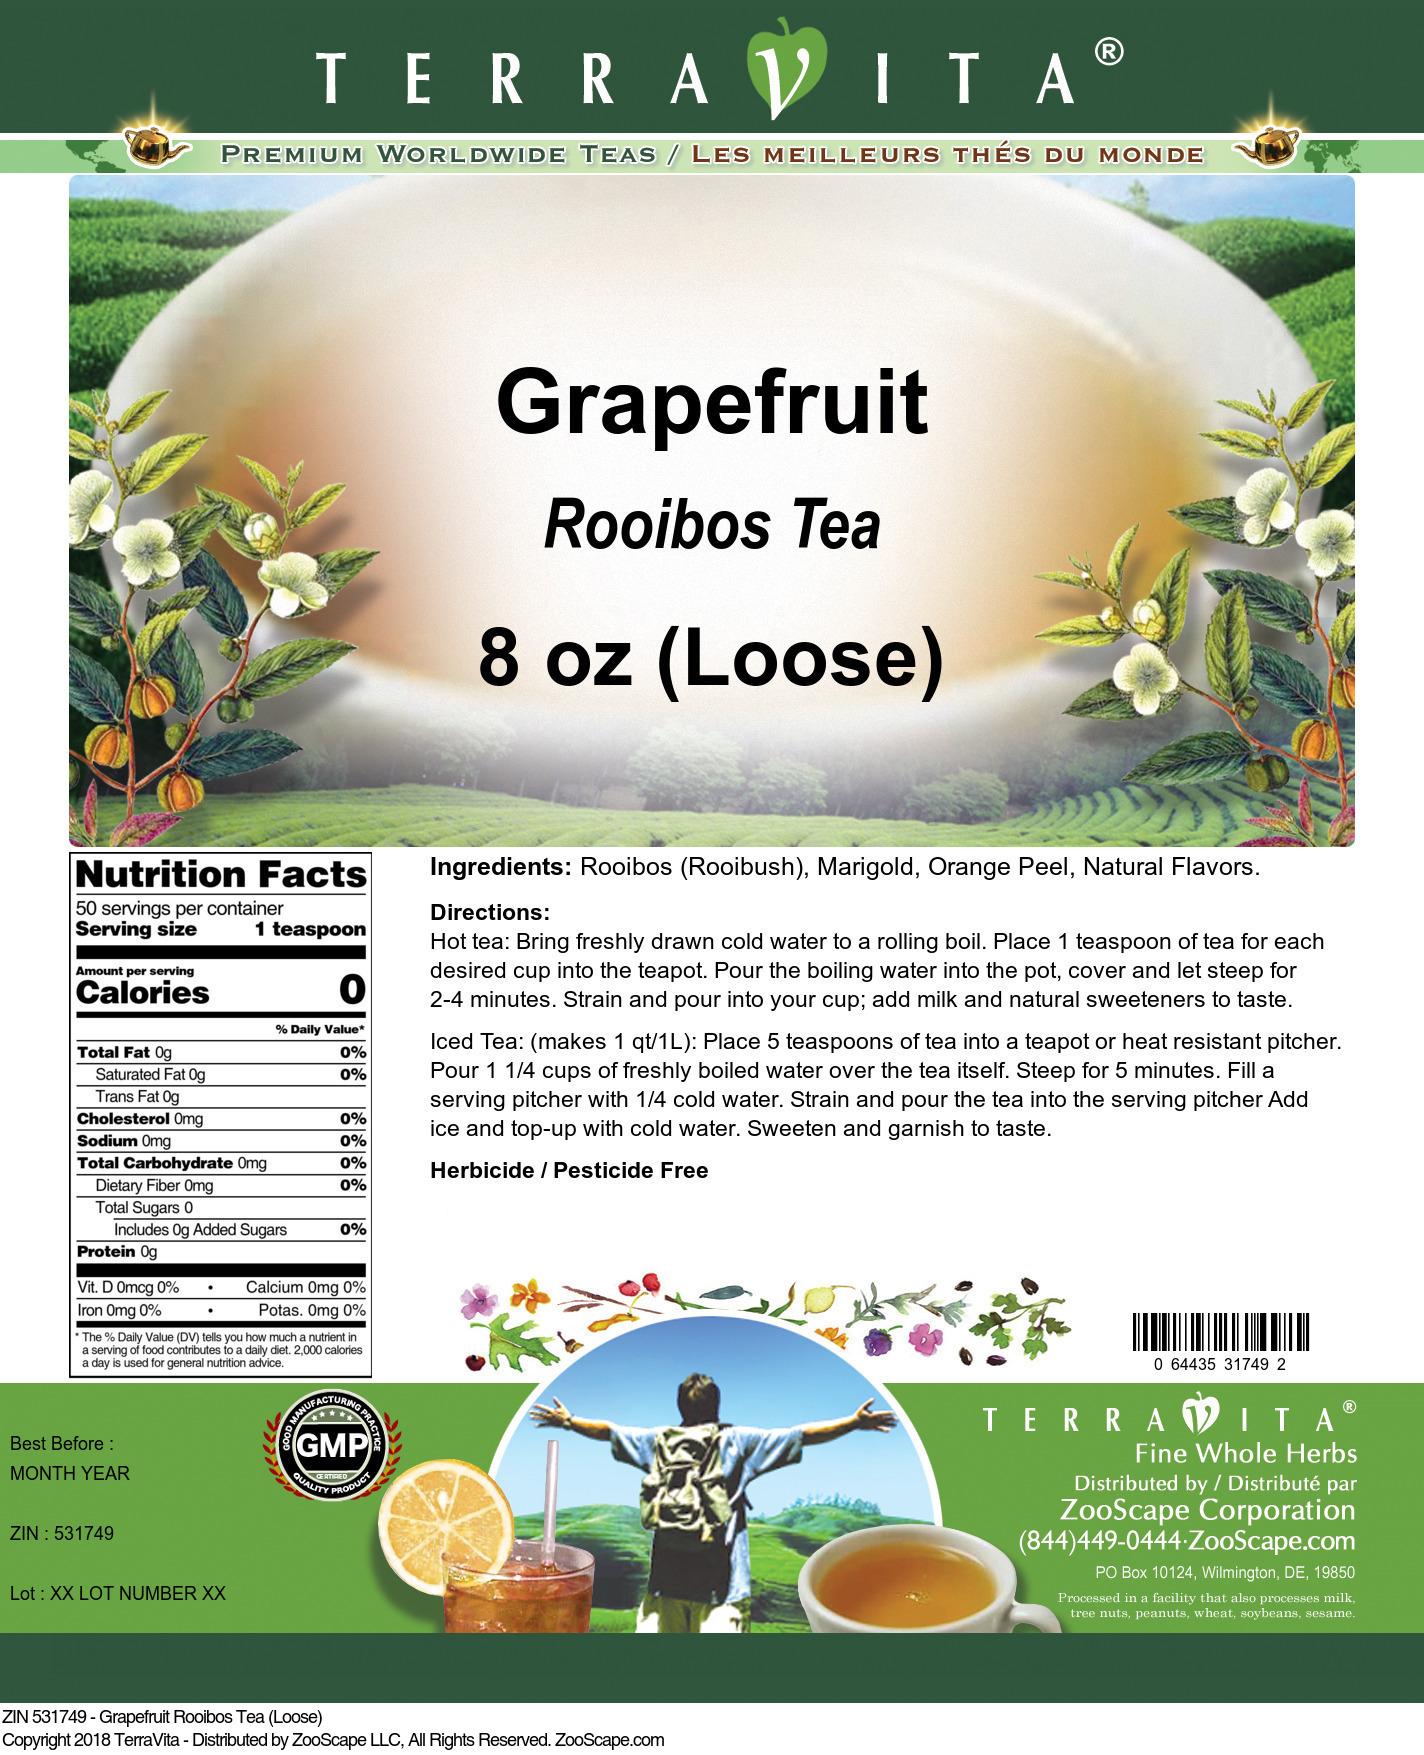 Grapefruit Rooibos Tea (Loose)